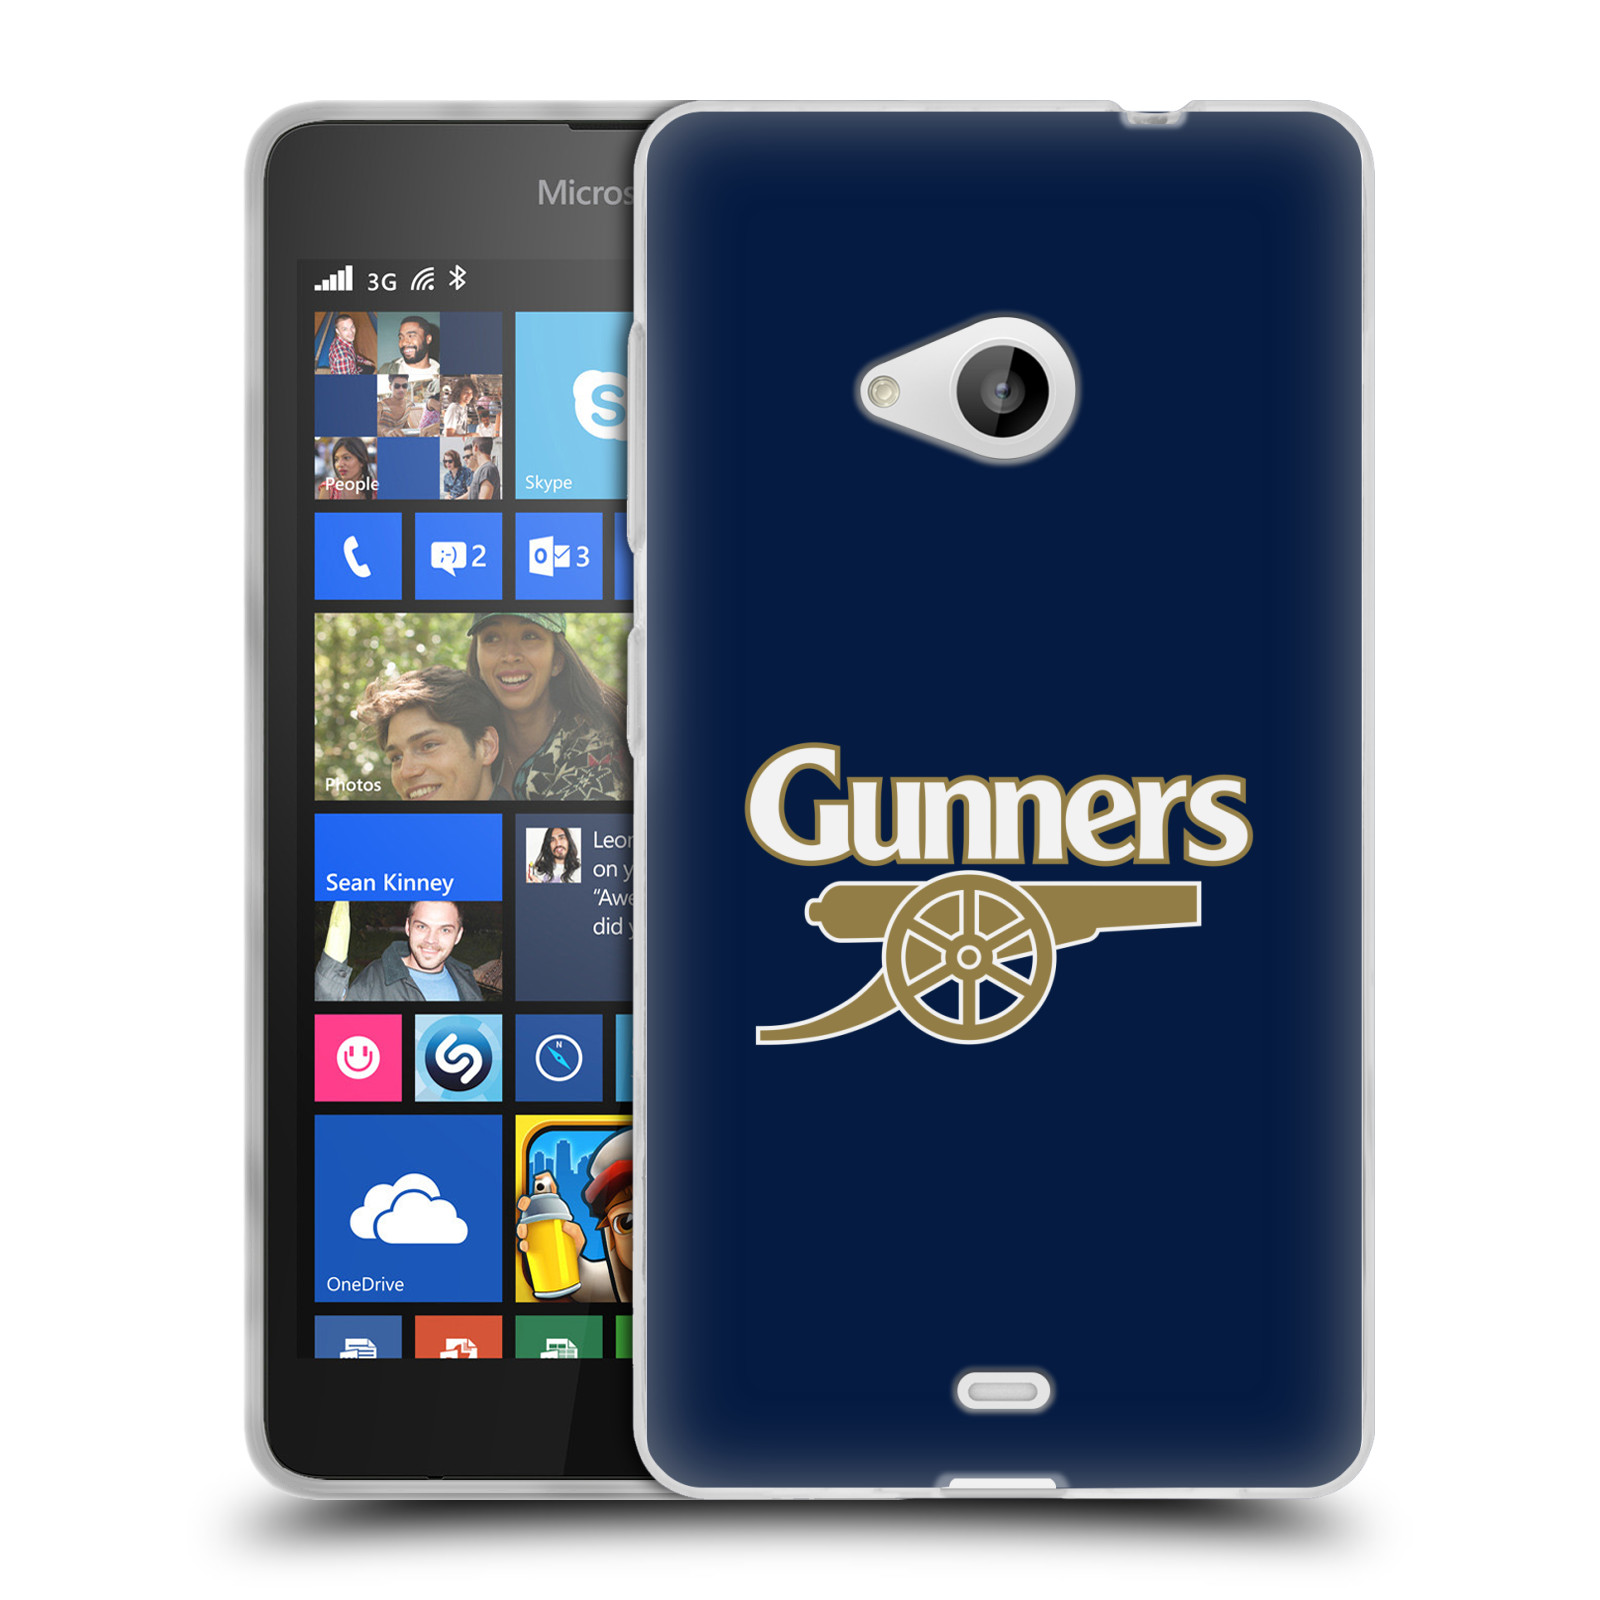 Silikonové pouzdro na mobil Microsoft Lumia 535 - Head Case - Arsenal FC - Gunners